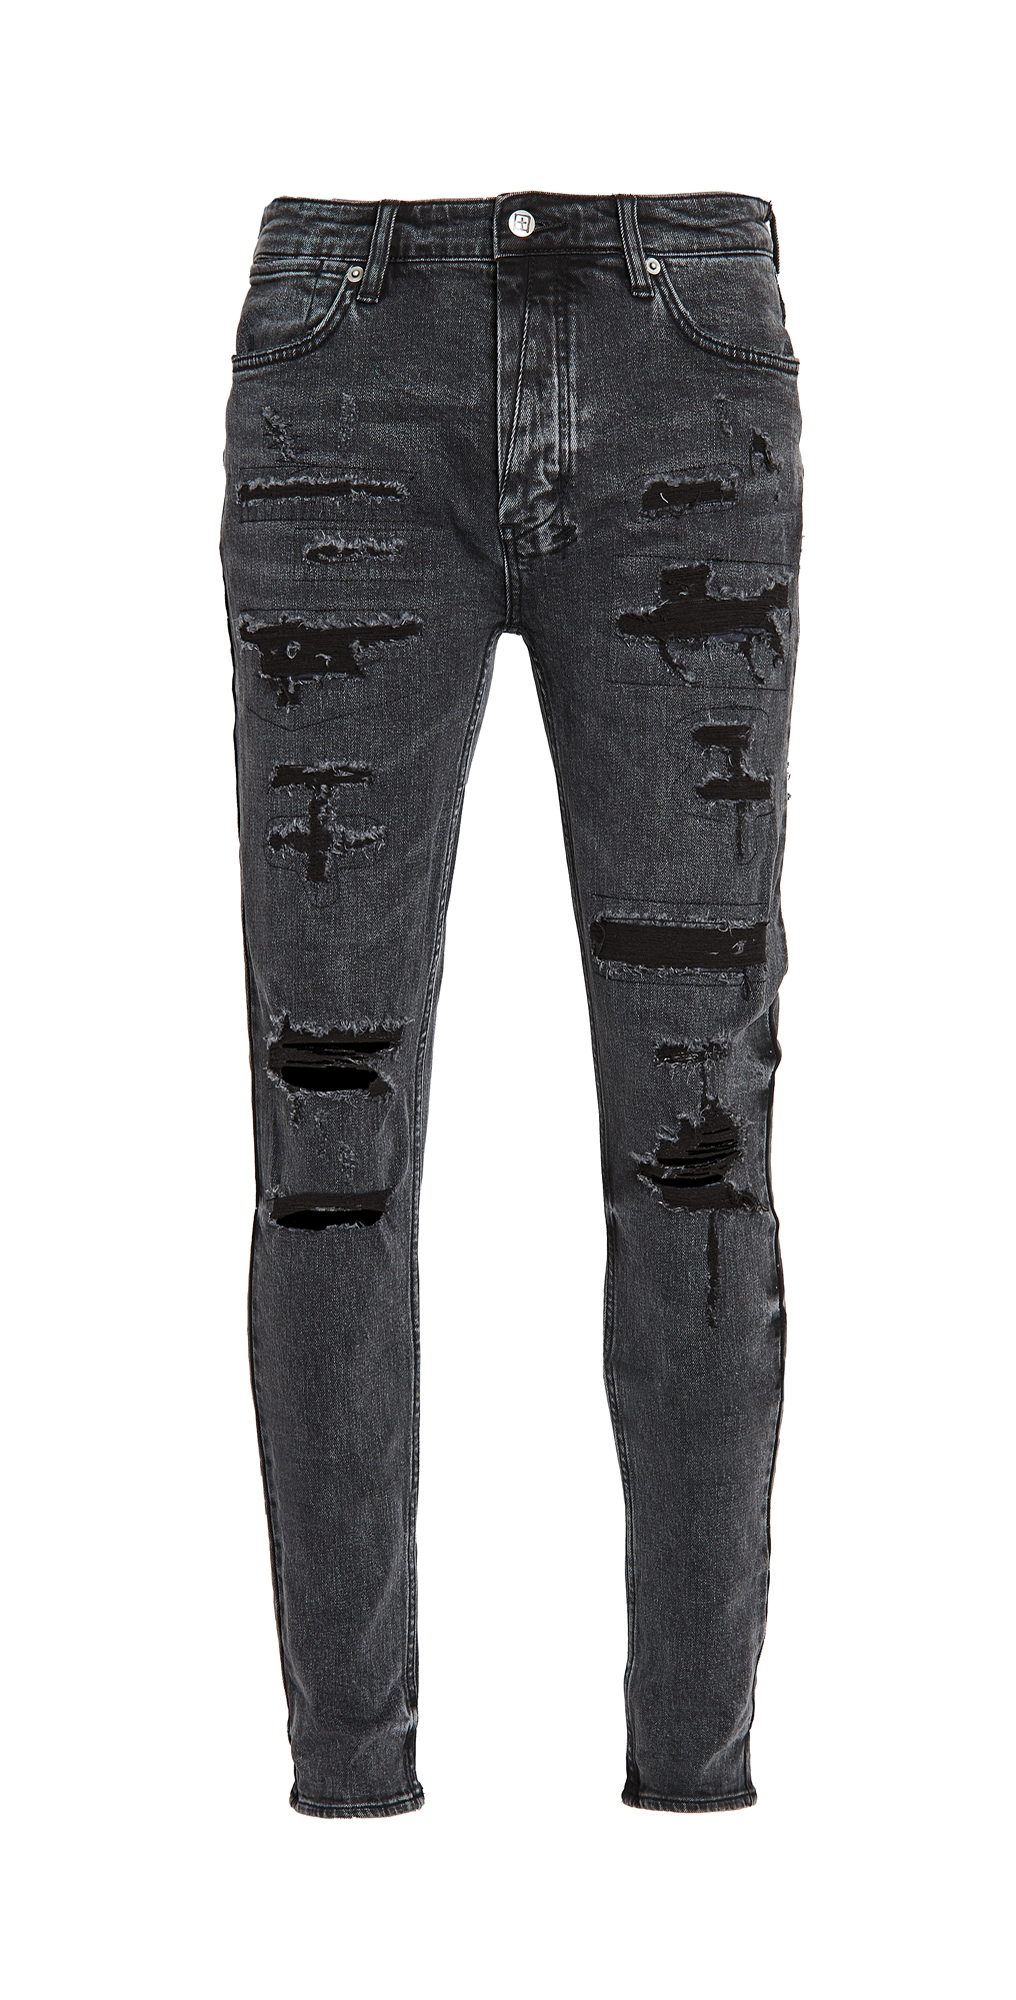 Ksubi Van Winkle Black Dynamite Trash Jeans